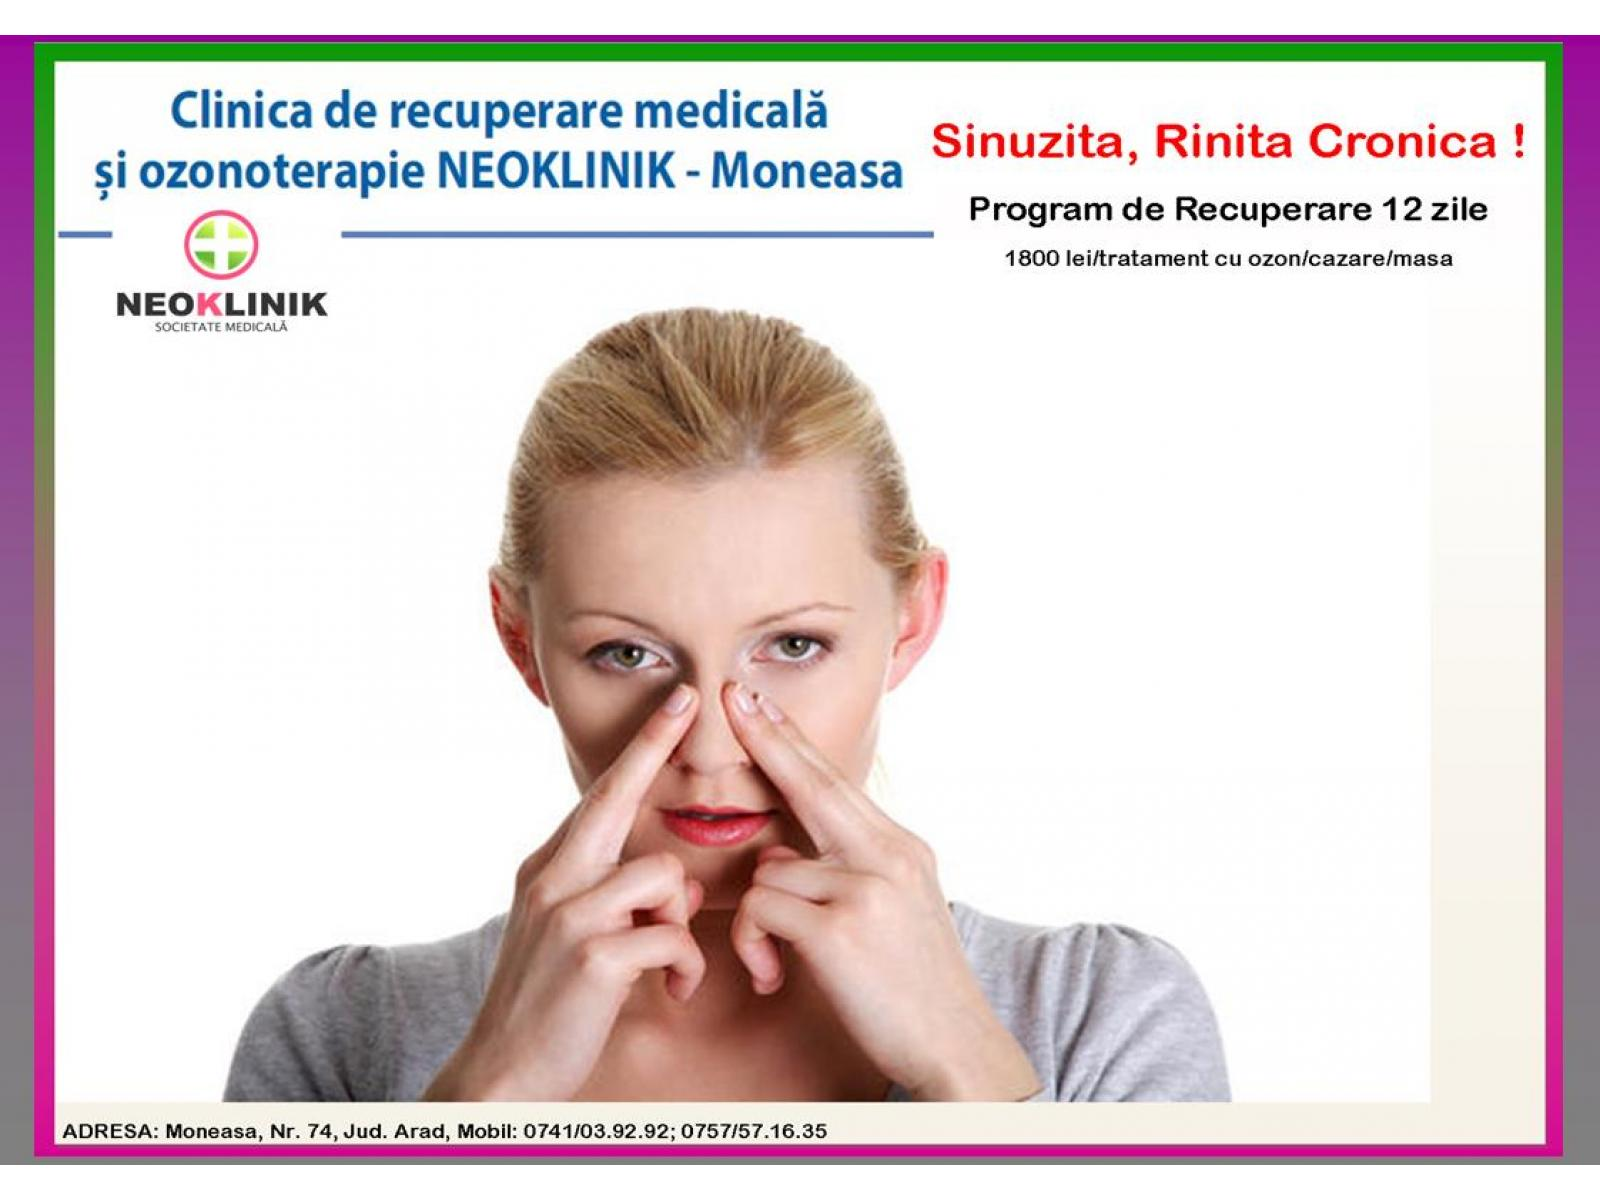 NeoKlinik - Sinuzita.jpg